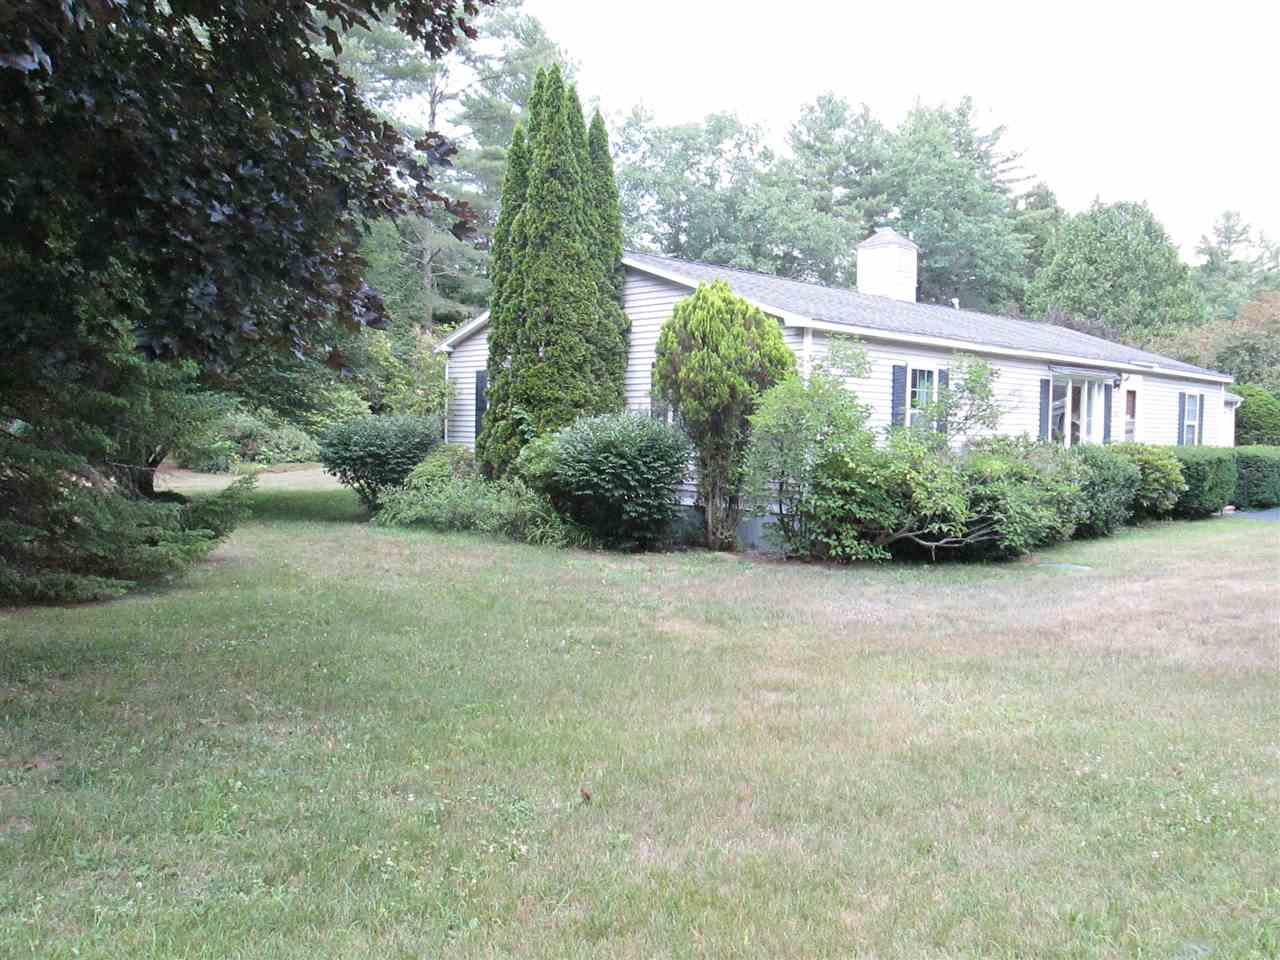 183 DEER PATH, HOPKINTON, NH 03229  Photo 3